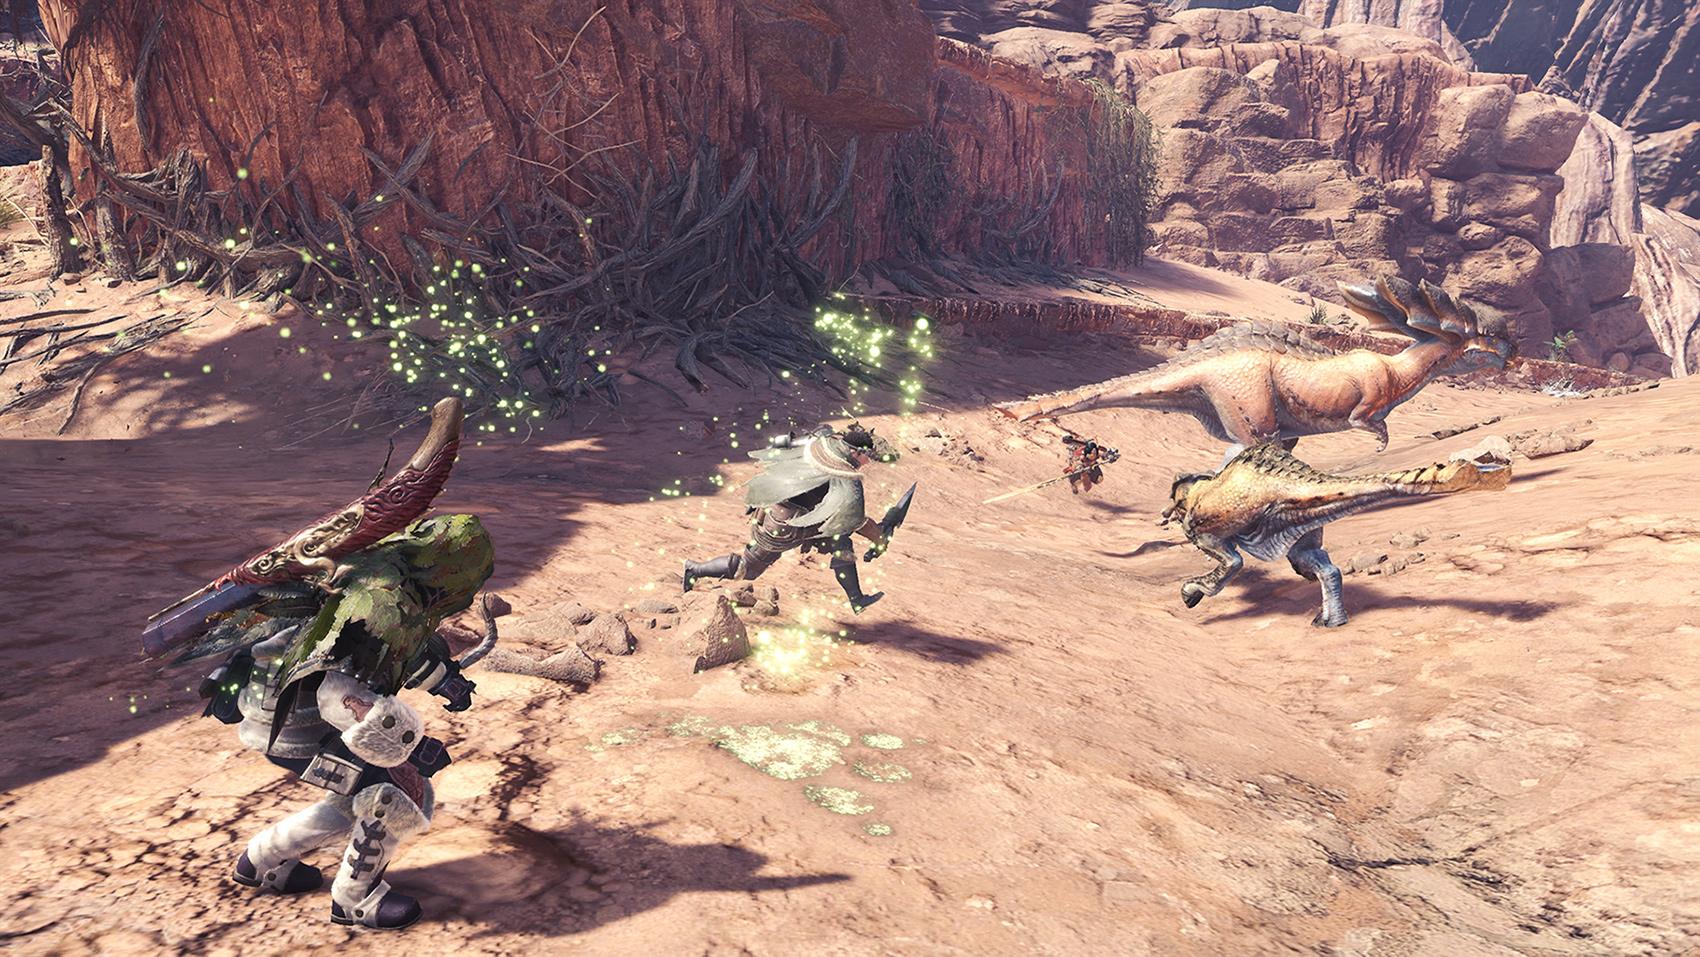 This Monster Hunter: World mod removes Scoutflies screenshot